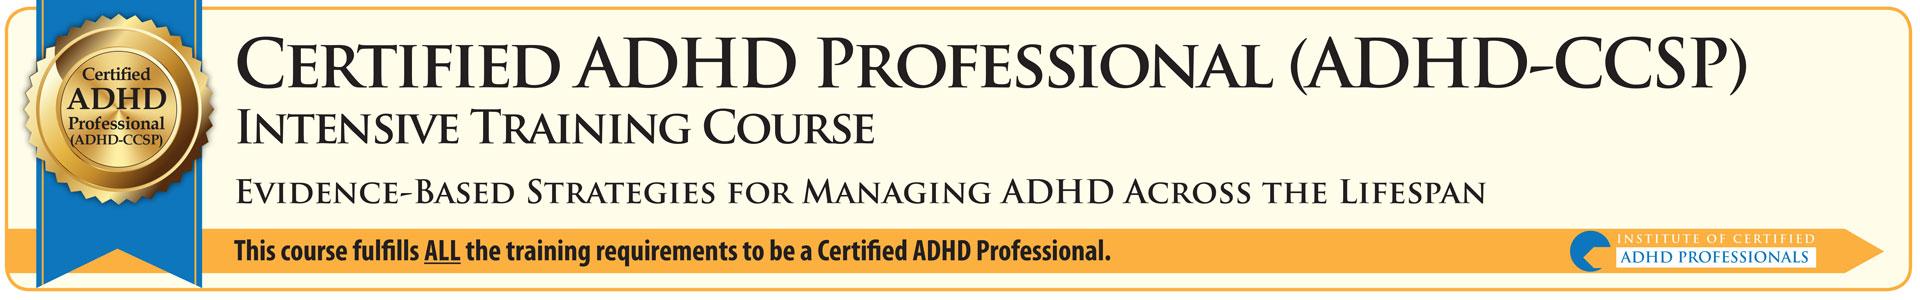 ADHD Intensive Training